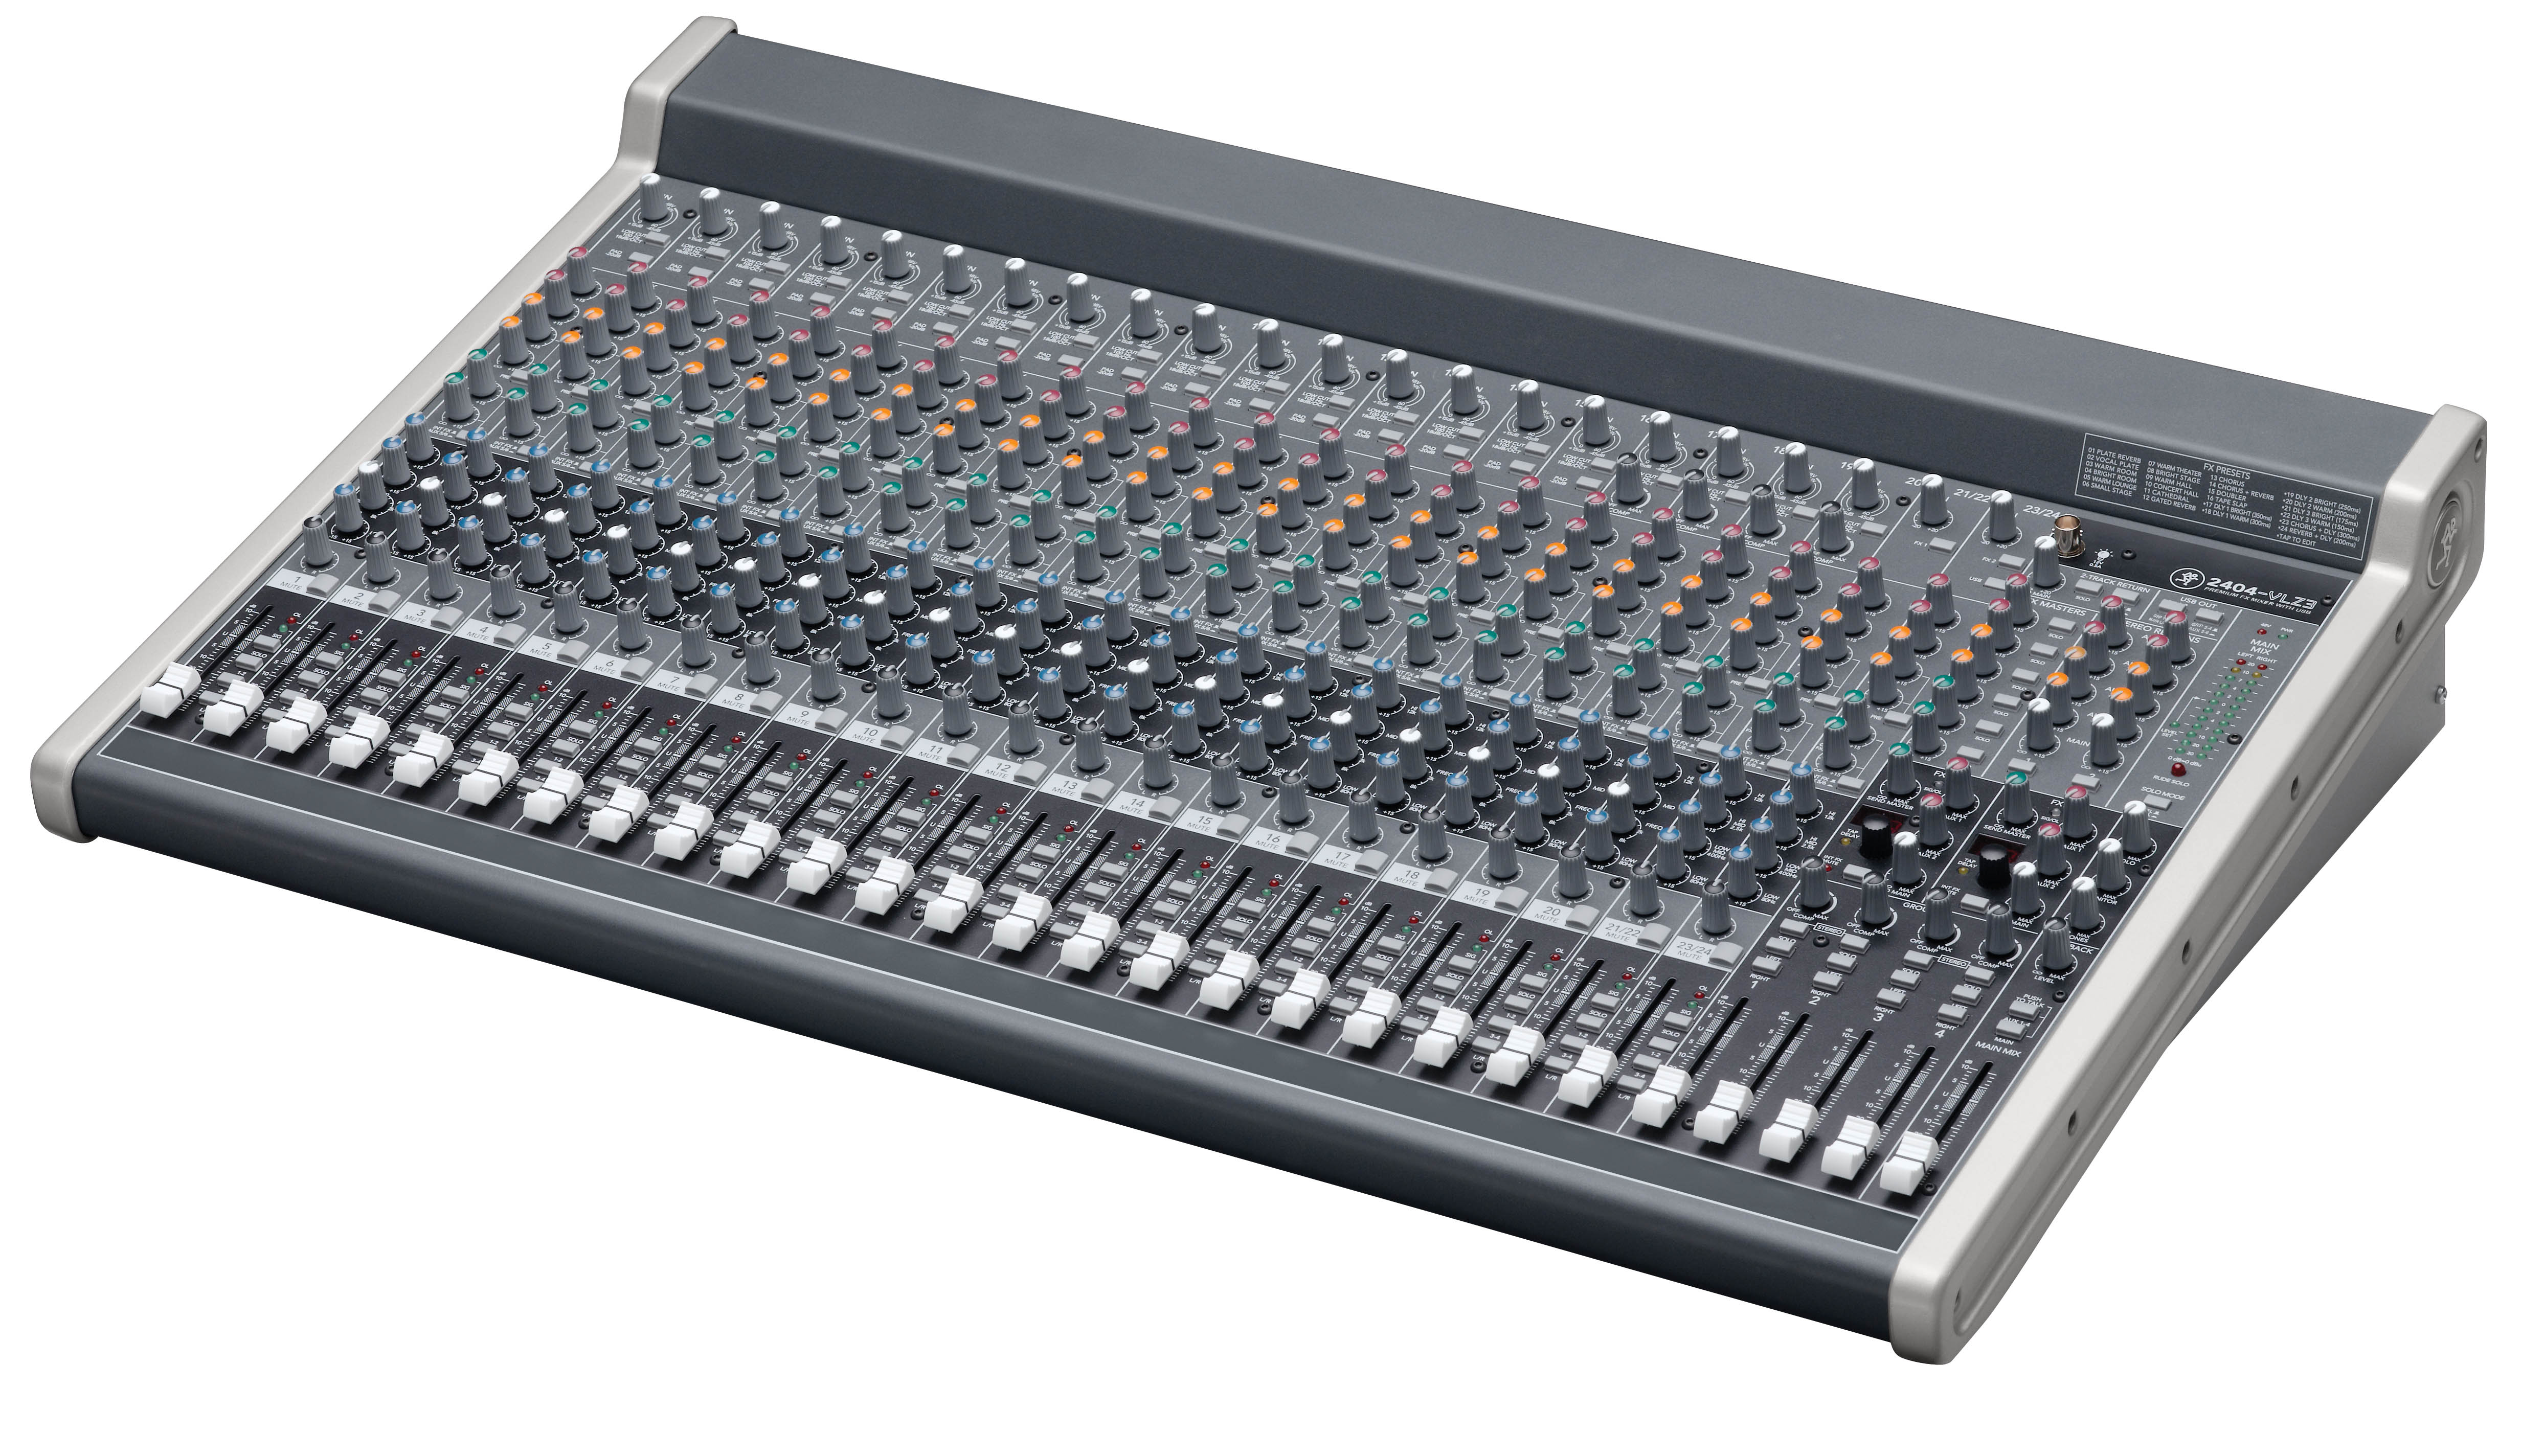 Mackie Vs Behringer Vs Yamaha Mixers